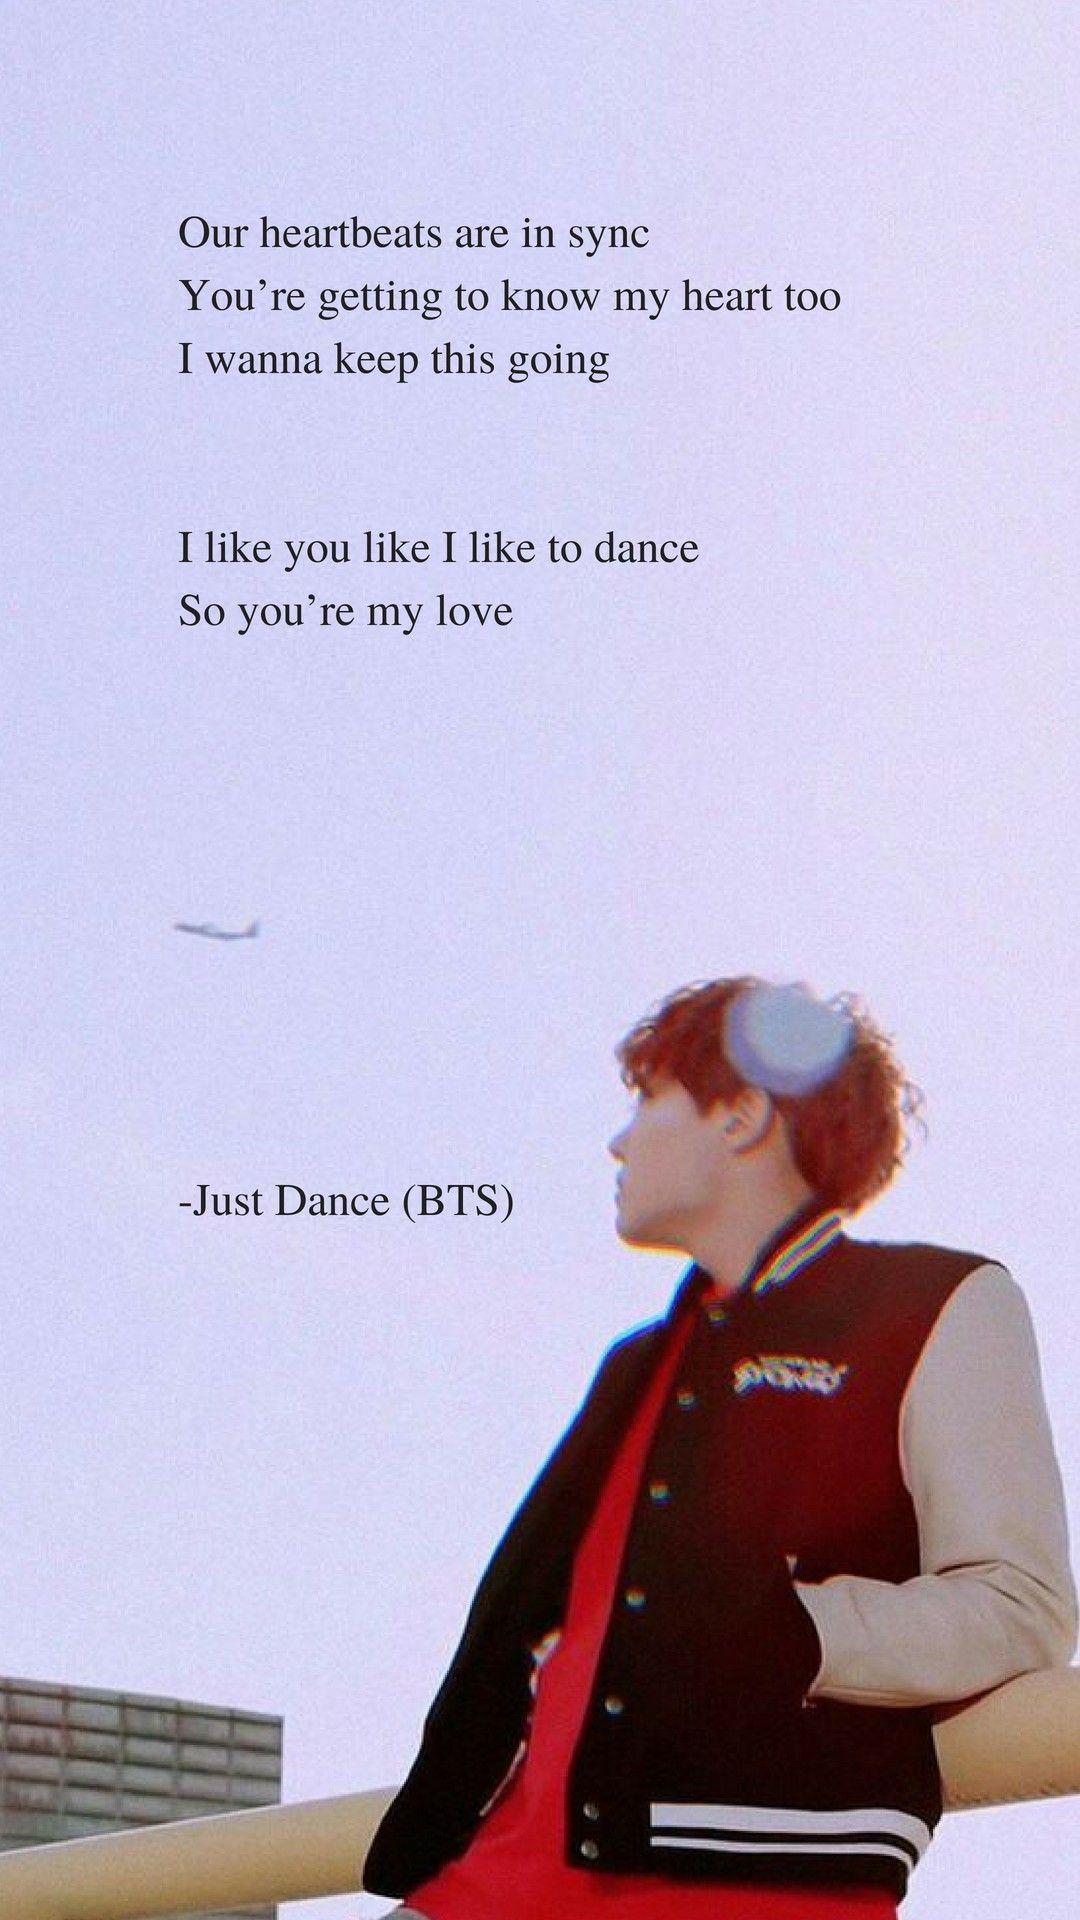 Just Dance By Bts Jhope Lyrics Wallpaper Bts Lyrics Quotes Bts Quotes Bts Song Lyrics